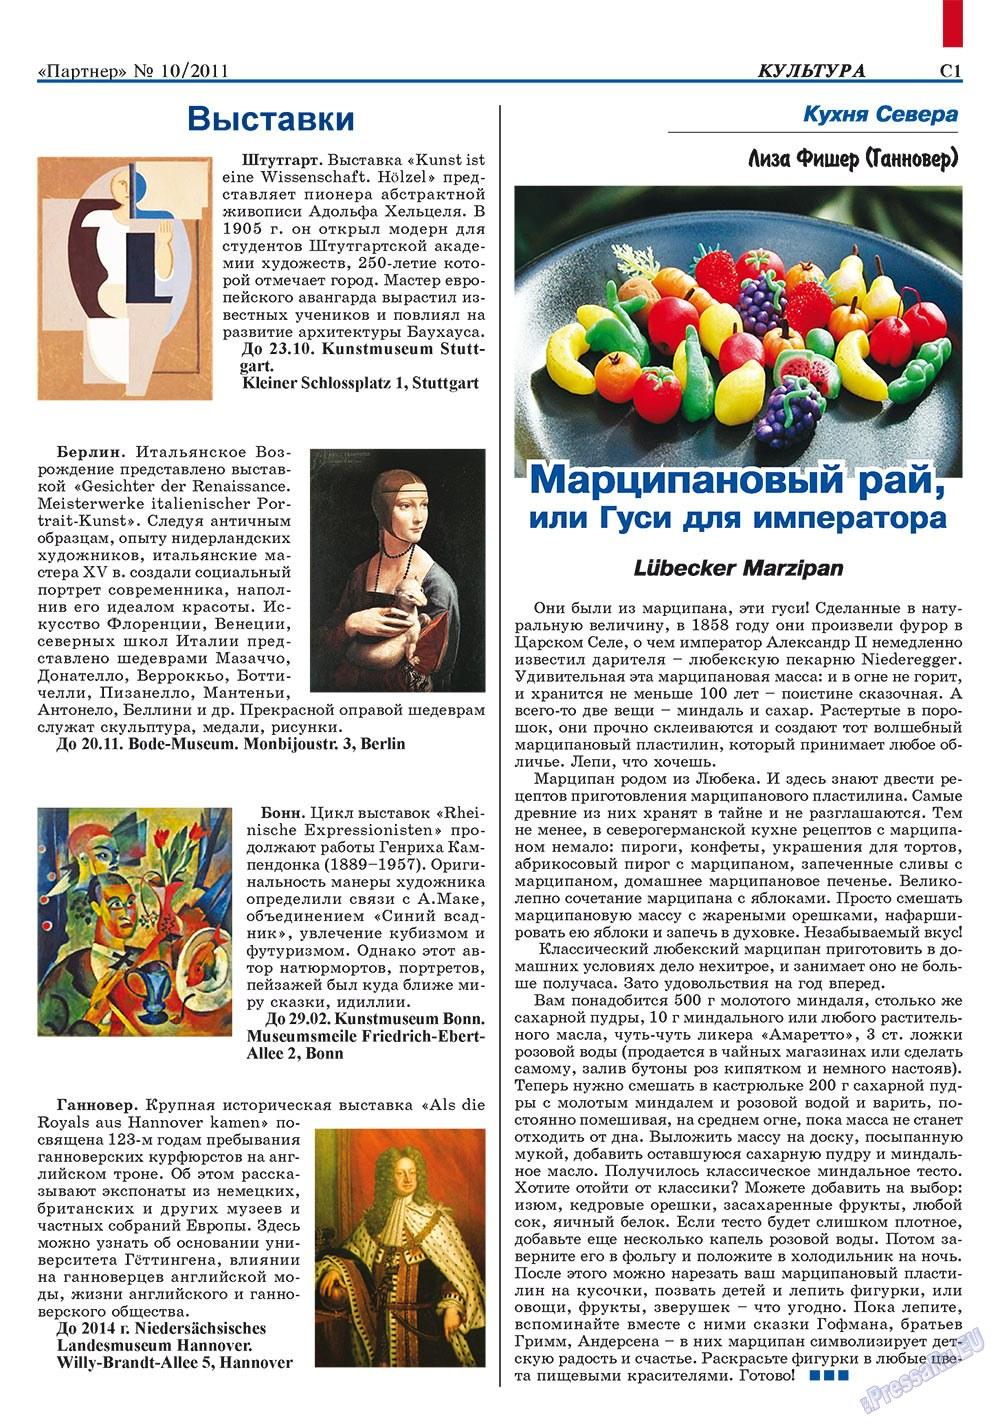 Партнер-север (журнал). 2011 год, номер 10, стр. 59